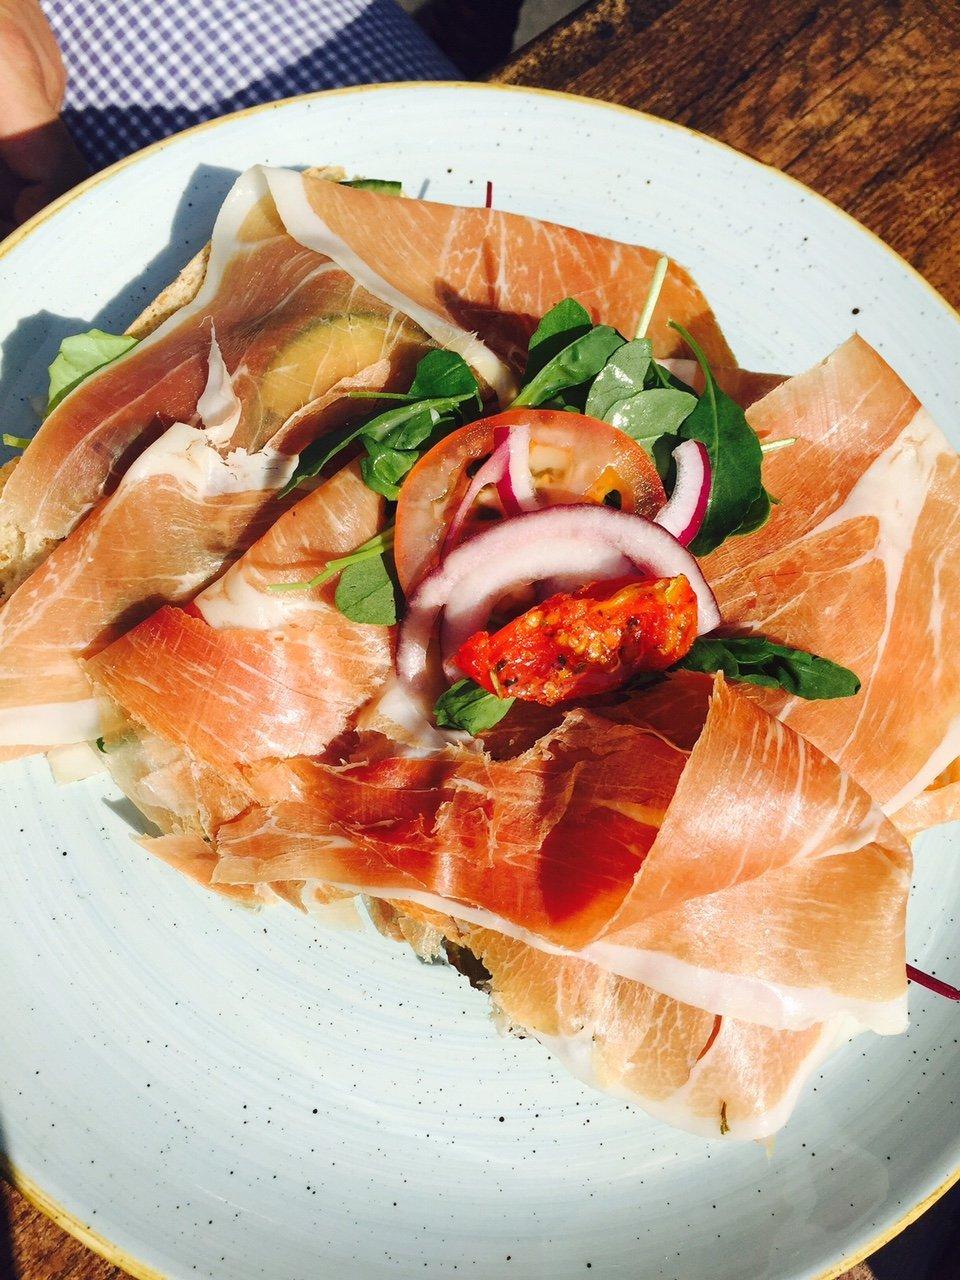 Broodje serranoham lunch Waalwijk Brabant foodblogger Foodinista